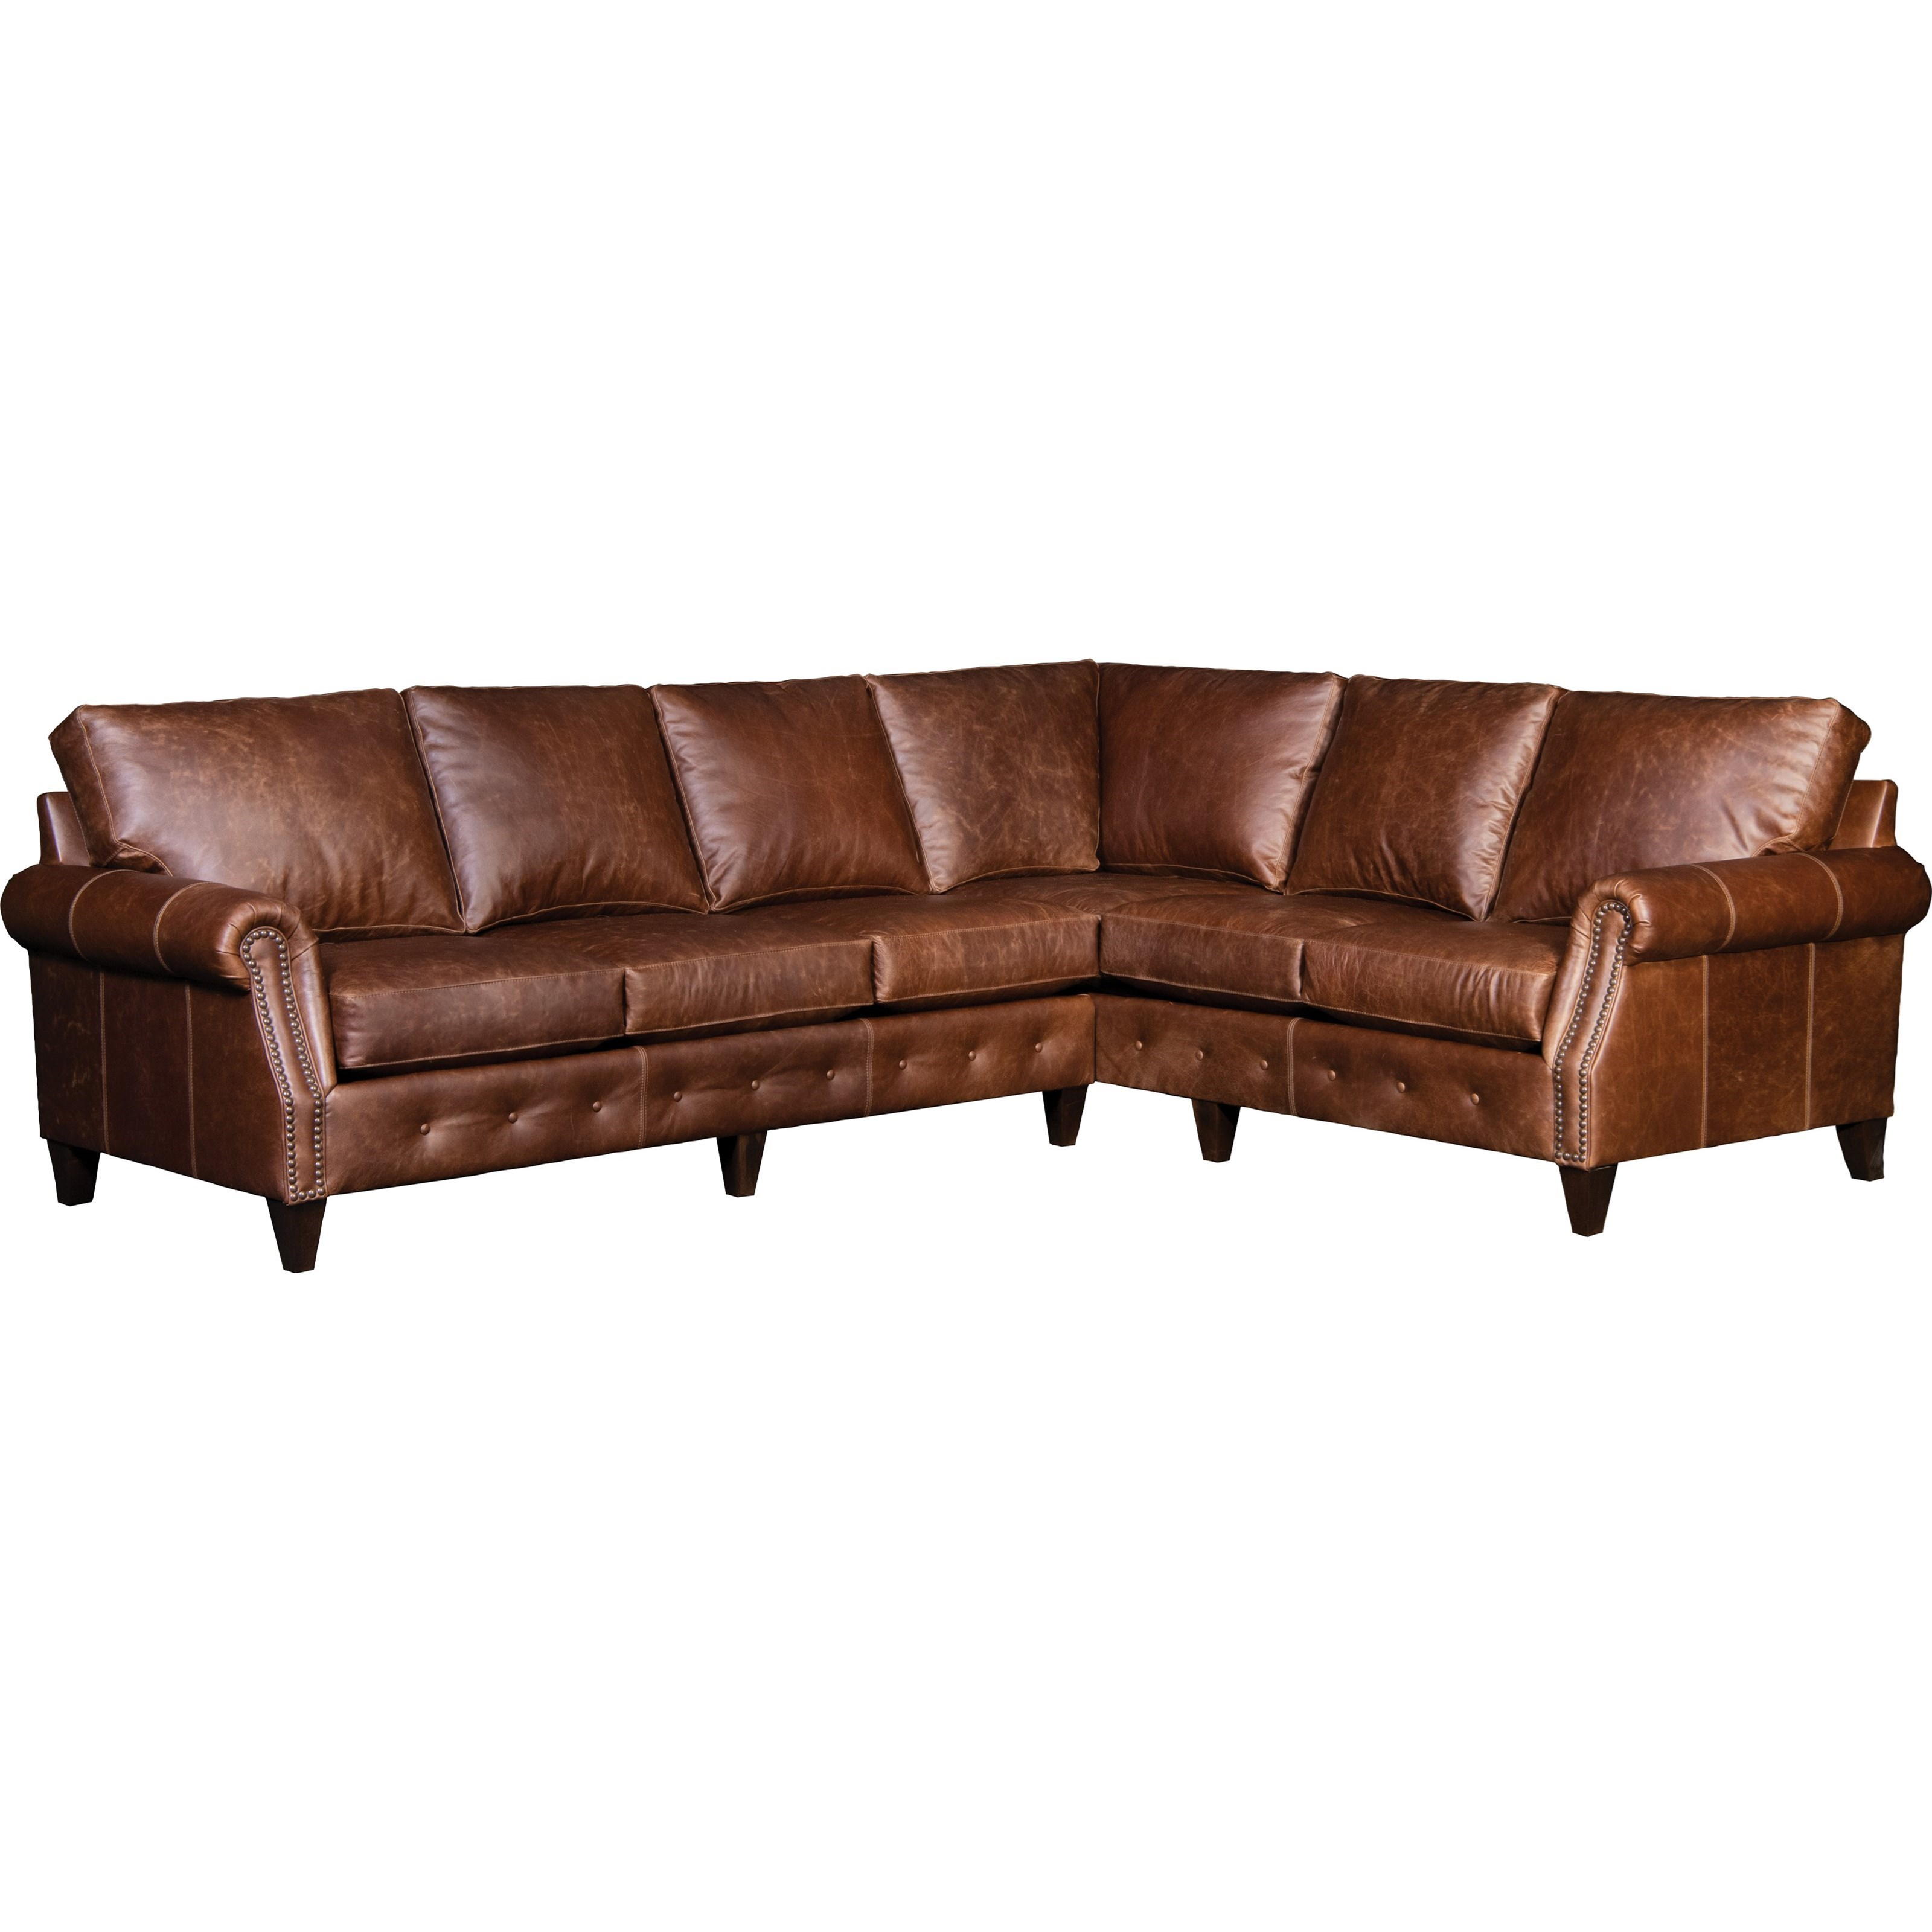 4040 5-Seat Sectional Sofa w/ LAF Sofa by Mayo at Pedigo Furniture